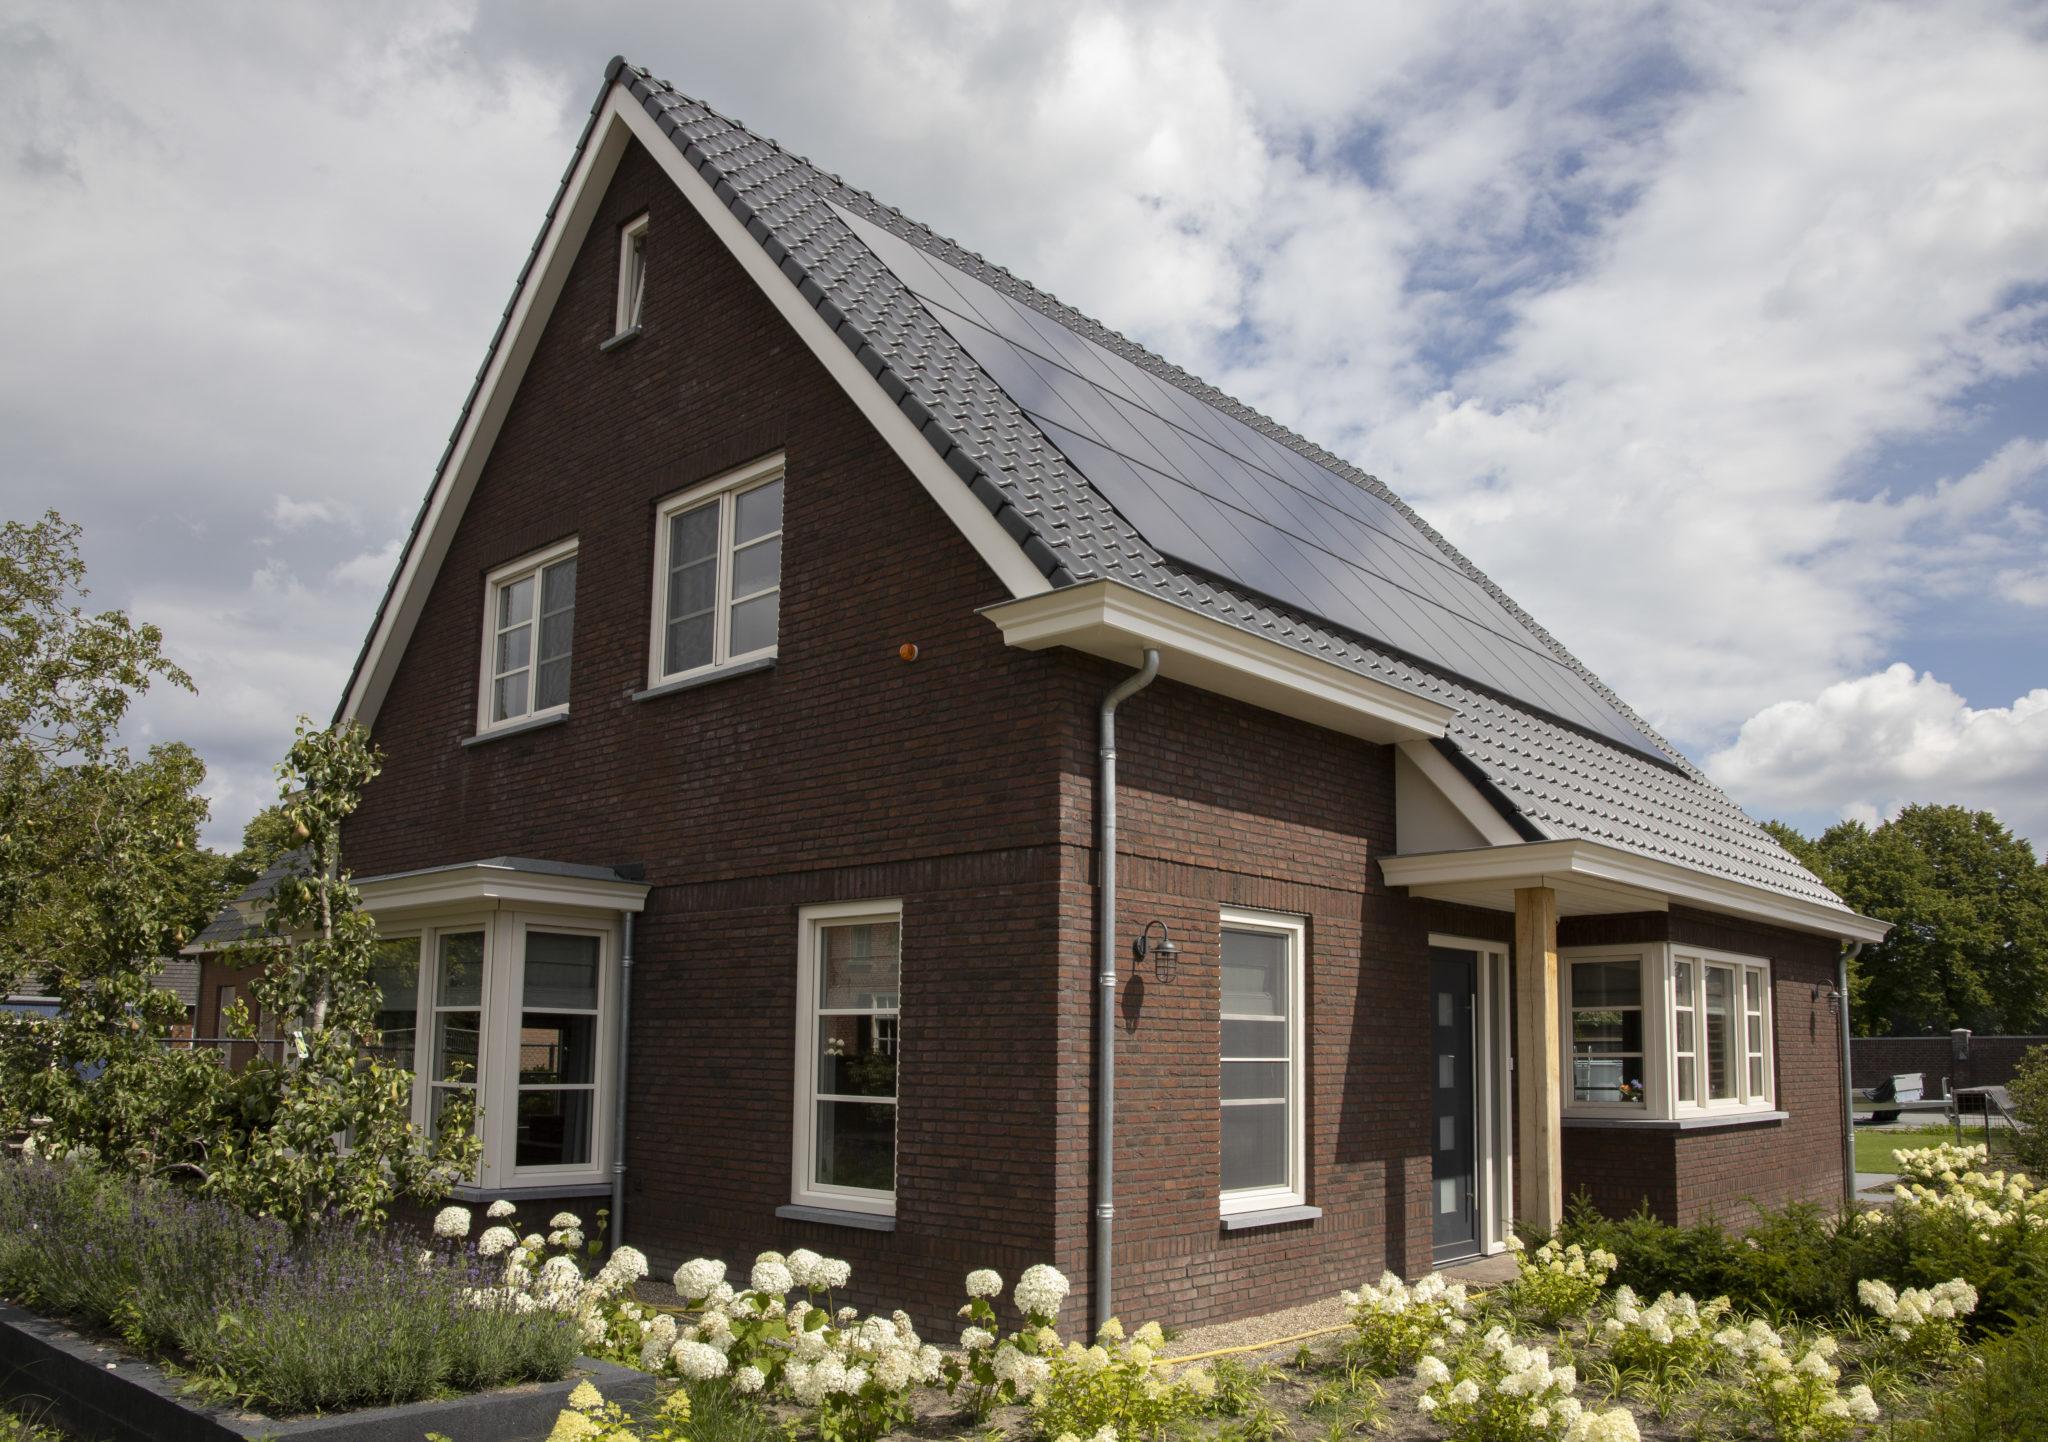 https://www.leonpeterskozijnen.nl/wp-content/uploads/2020/07/Leon23-scaled.jpg